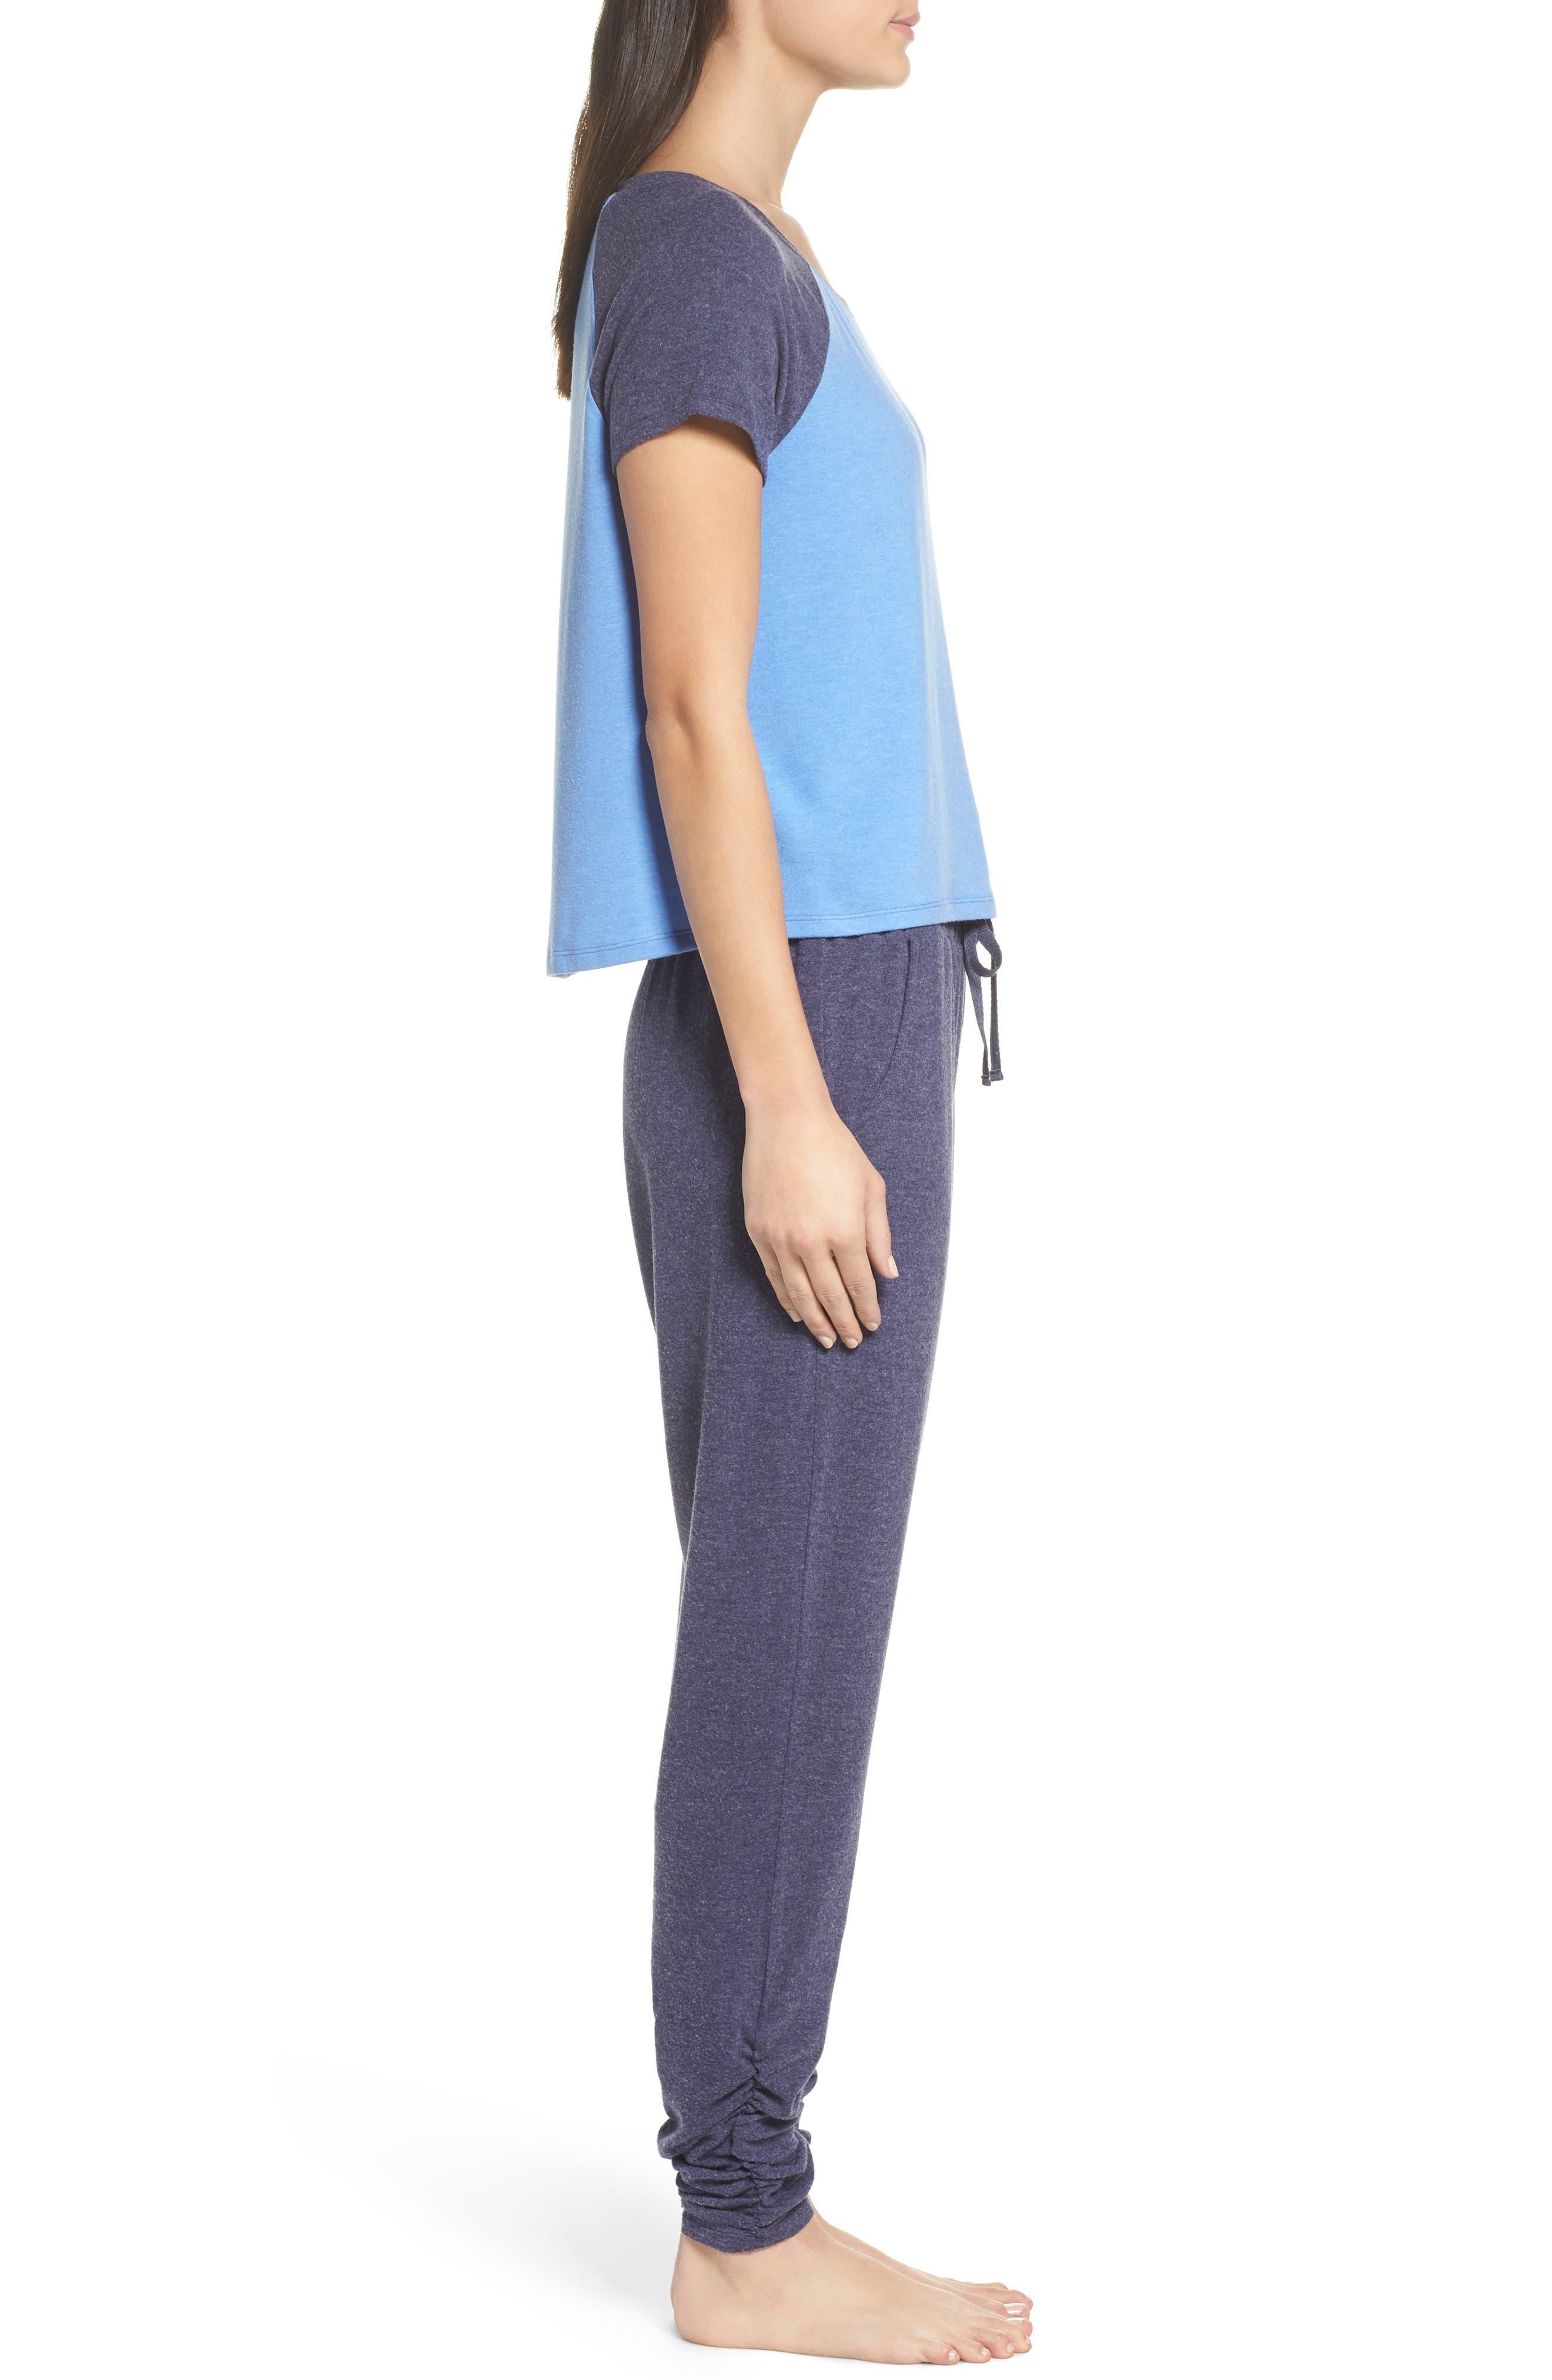 Cloud 9 Pajamas,                             Alternate thumbnail 3, color,                             Blue Azurite